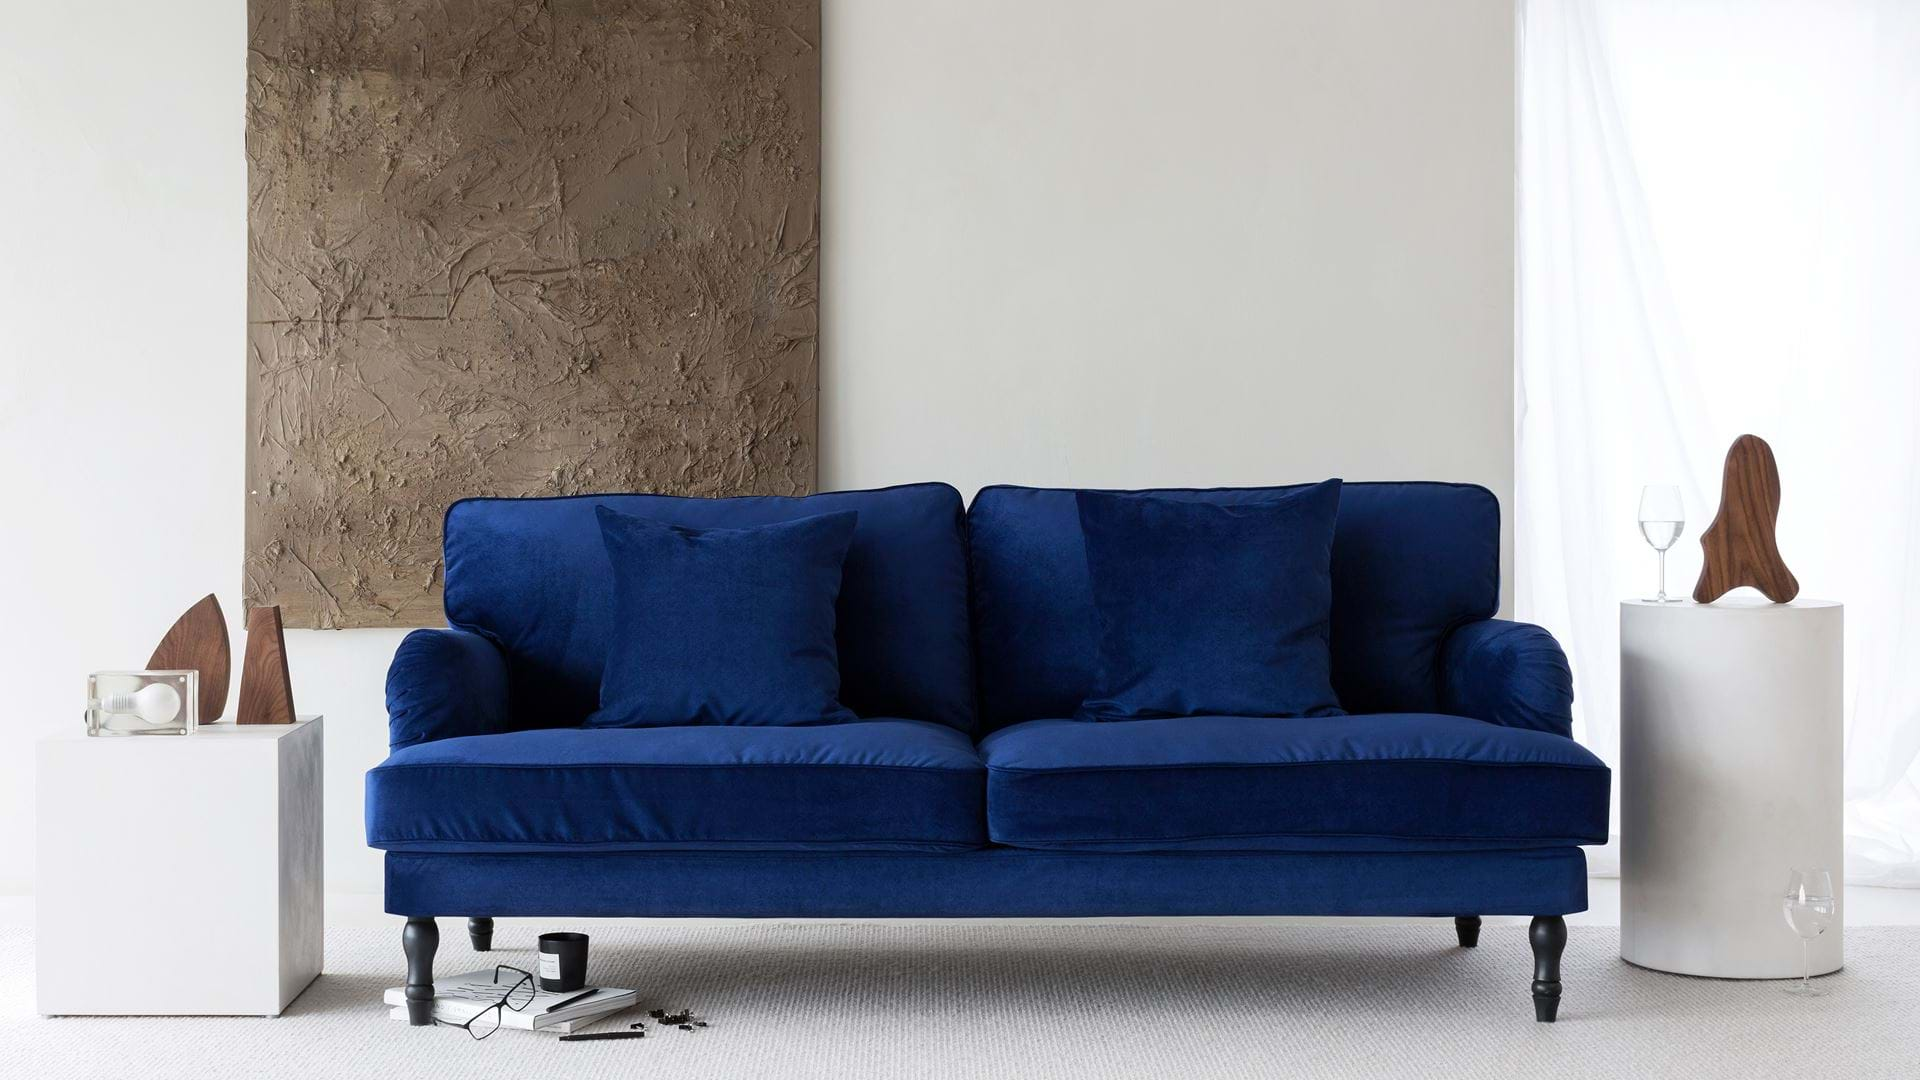 Bezug für 3er-Sofa Stocksund | Bemz